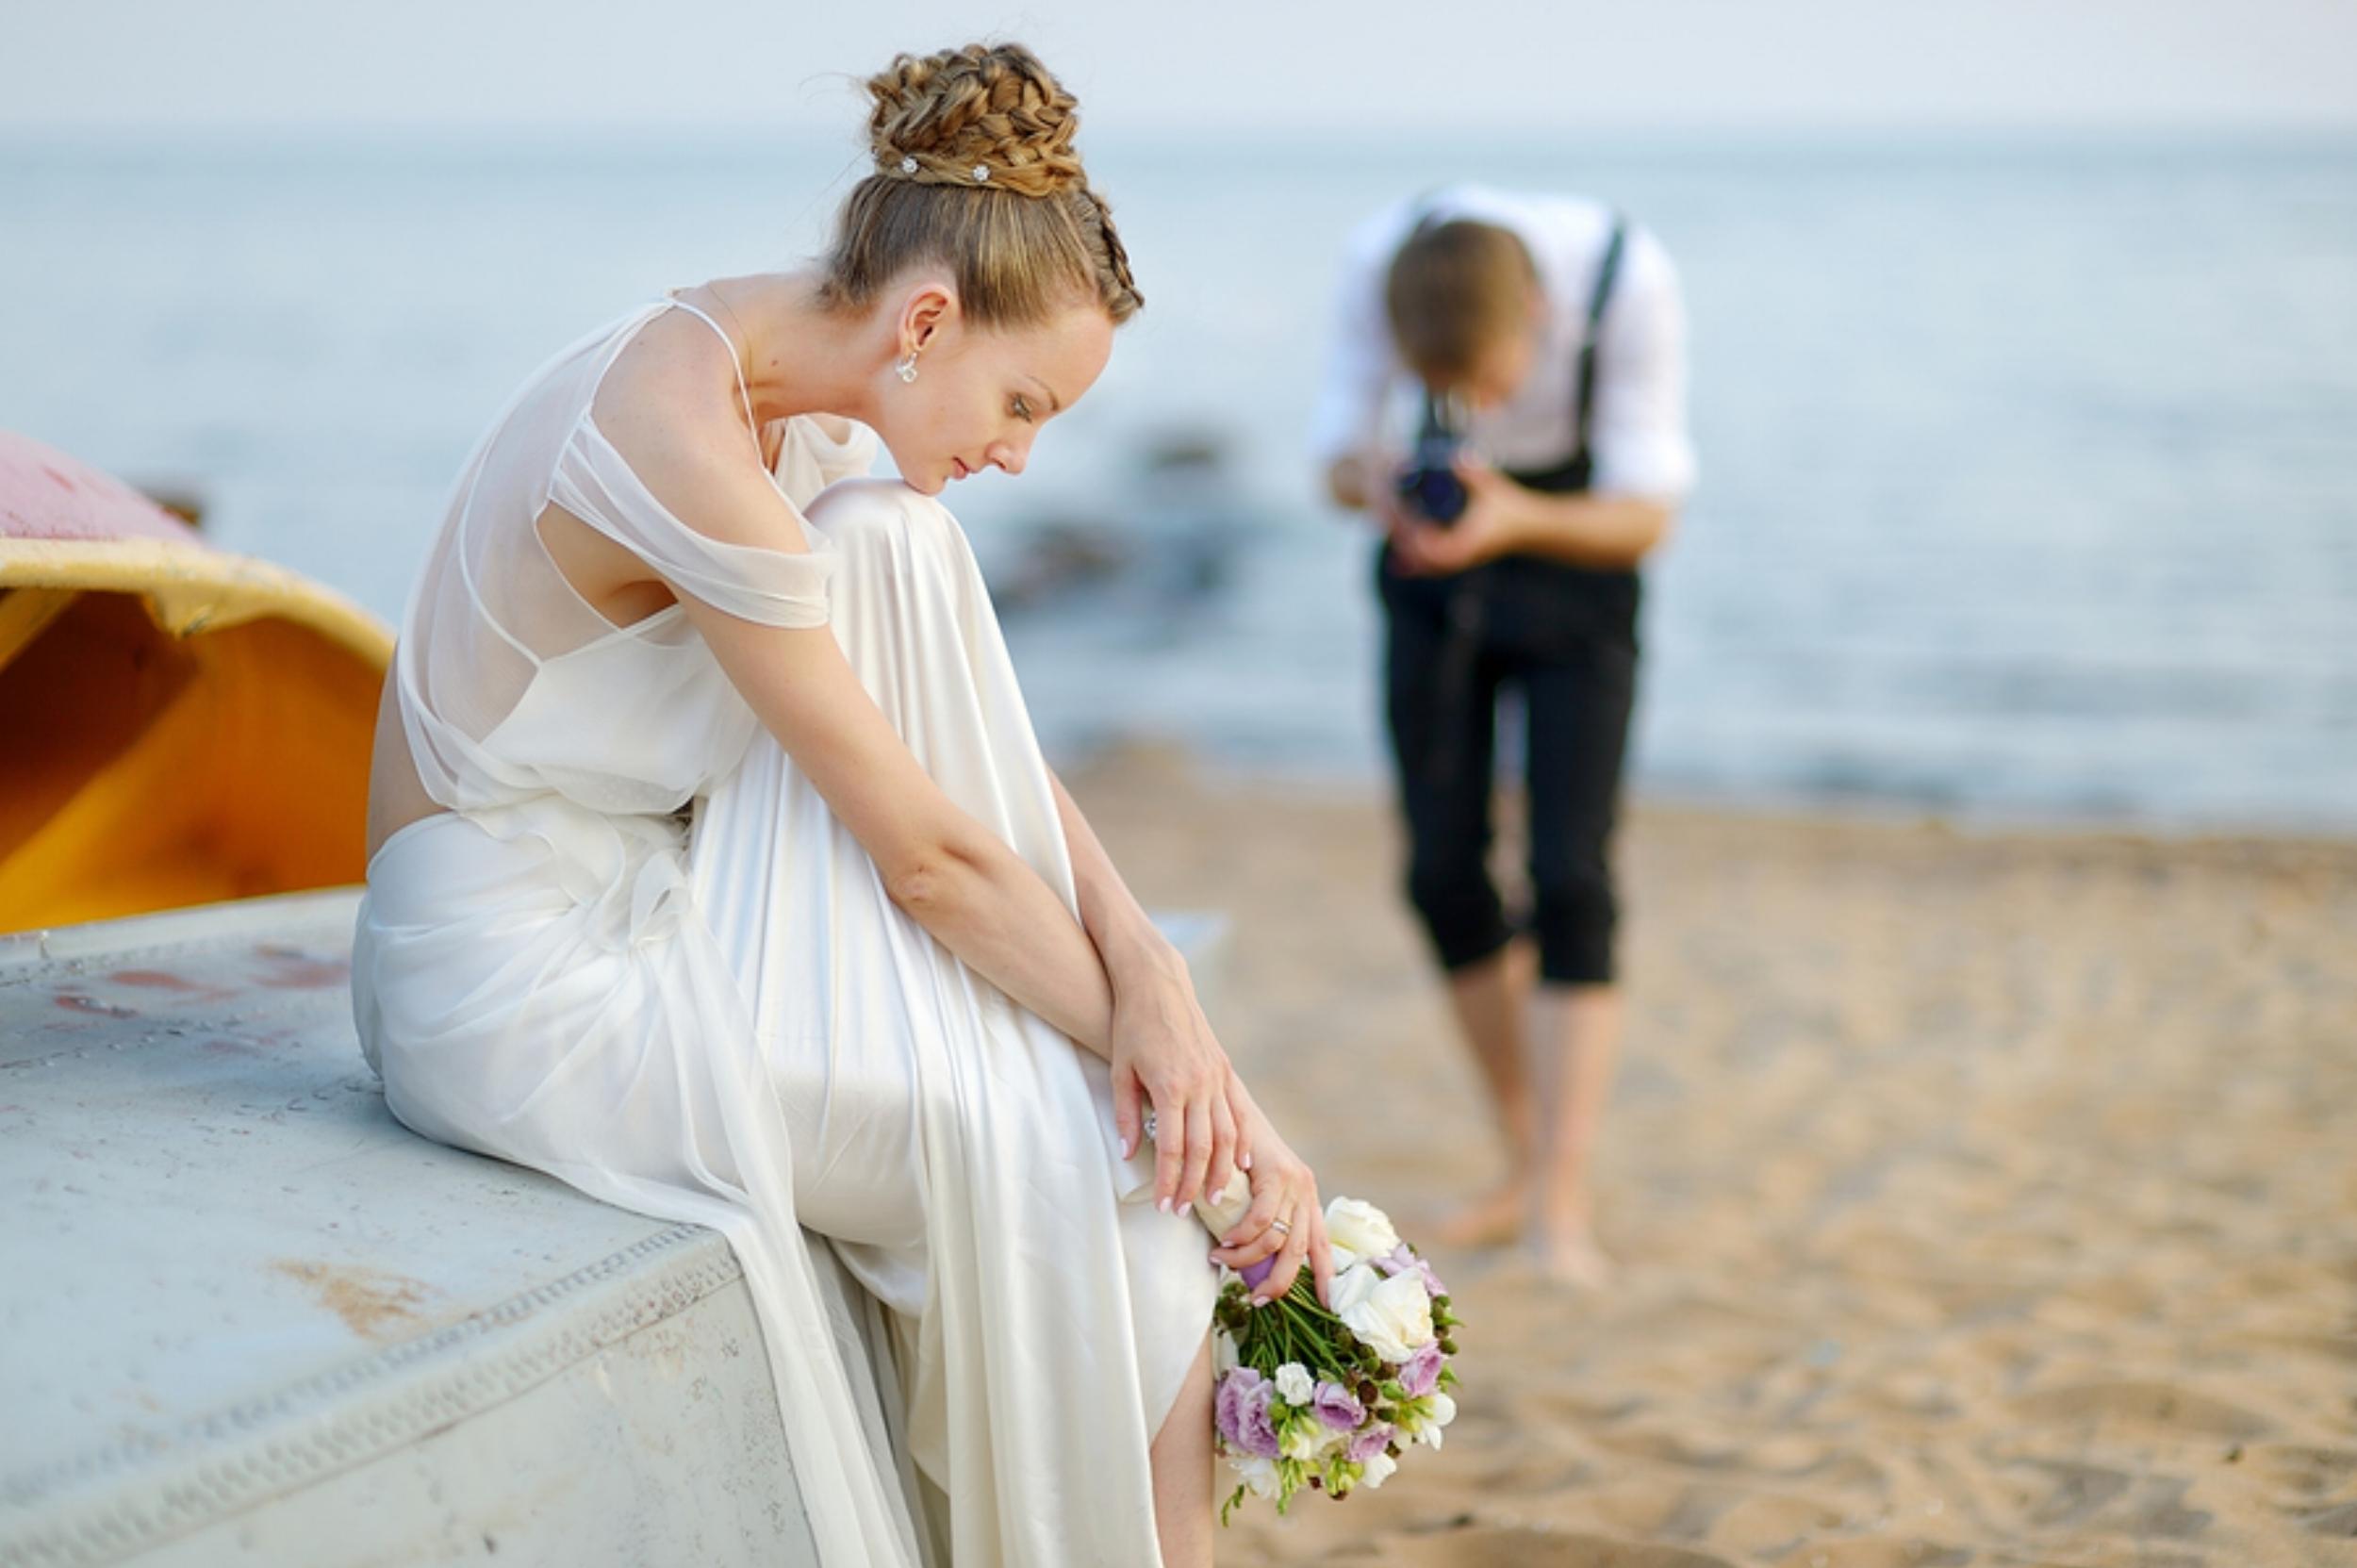 bigstock-Bride-Posing-For-Her-Groom-154122743.jpg